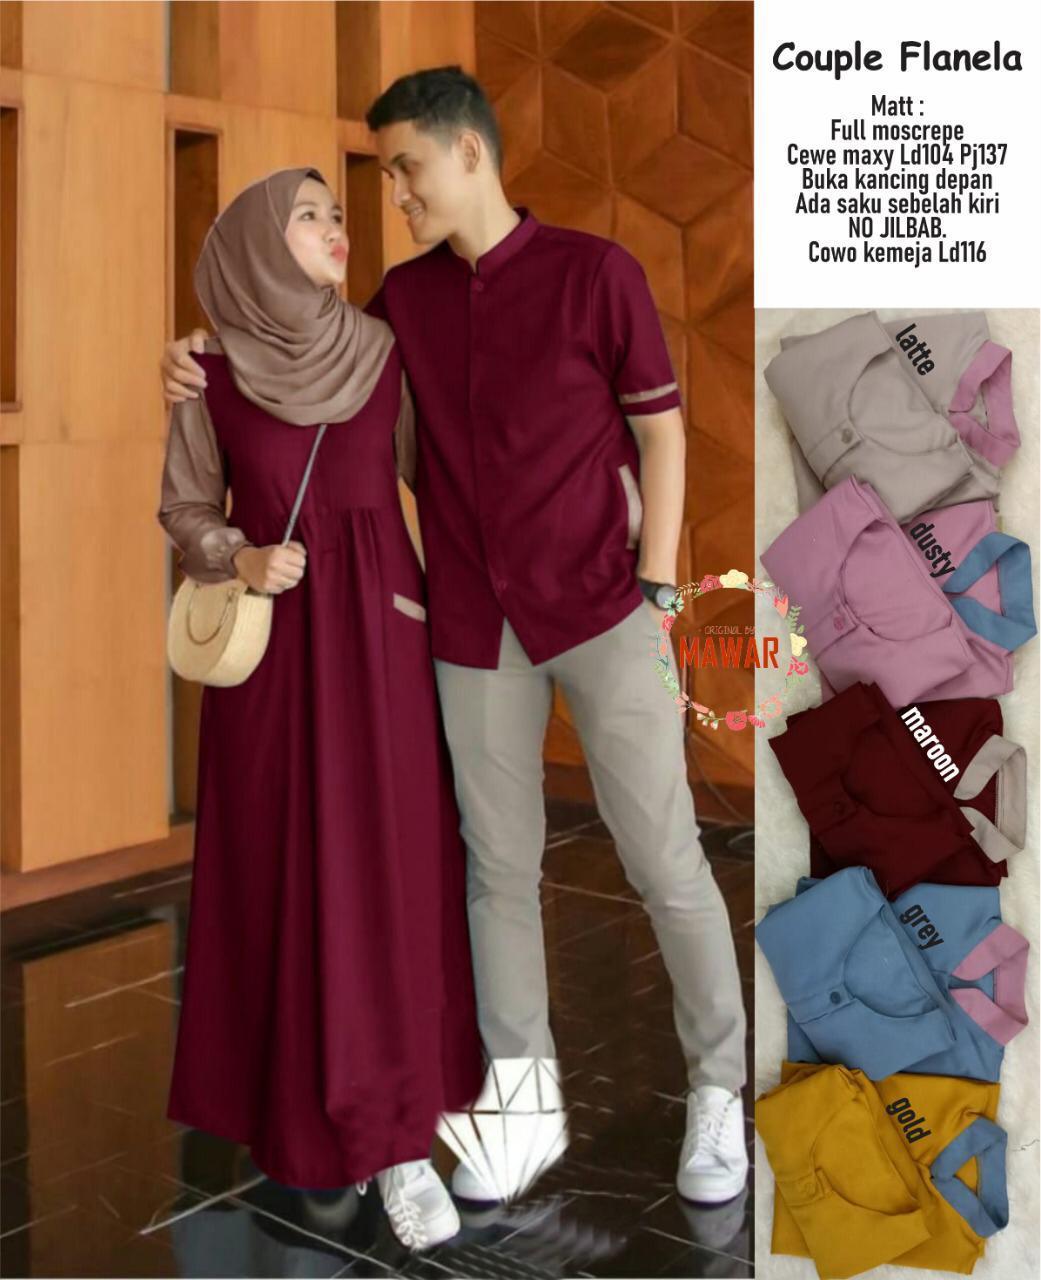 99,9% TERMURAH (COD) - Batik Couple -Batik wanita -Batik Pria -Baju Batik Couple / Batik Couple / Gamis Wanita Terbaru / Baju Muslim Wanita 2019 / Batik Murah / Batik Sarimbit / Batik Keluarga /Batik pasangan / Batik pernikahan / Batik Pekalongan #FLANELA